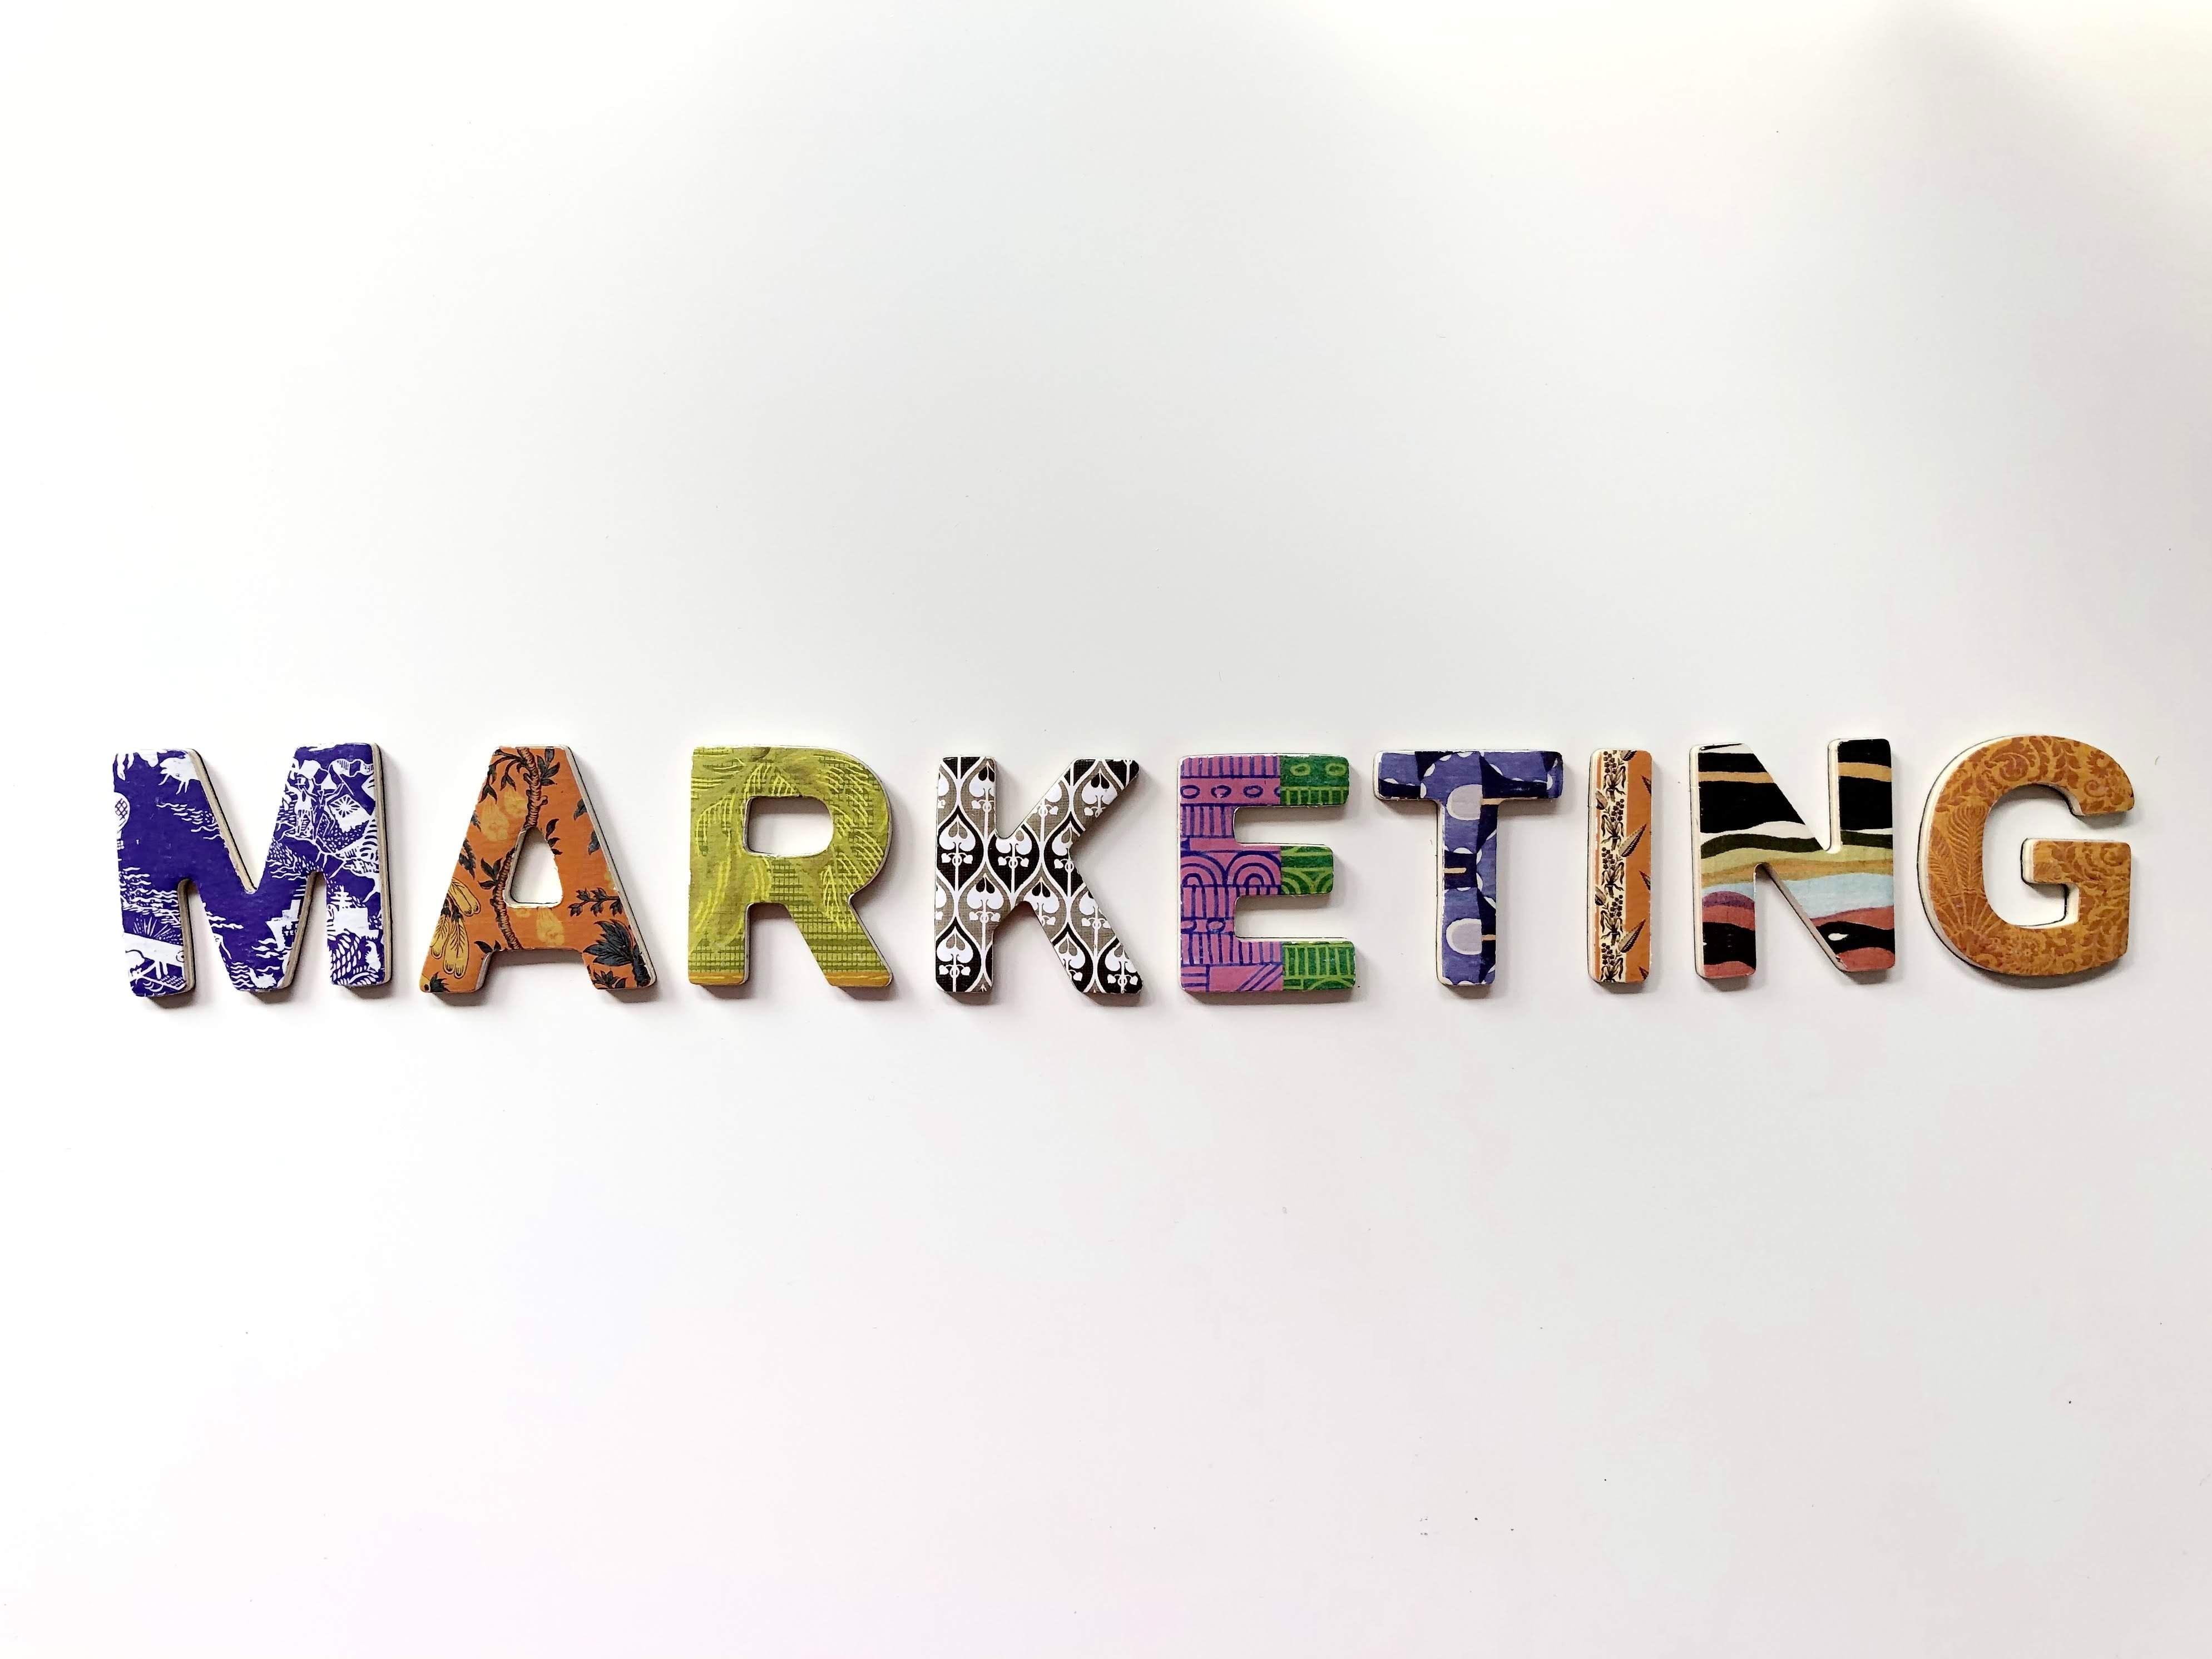 Gosh Promo UK – marketing in an age of COVID-19